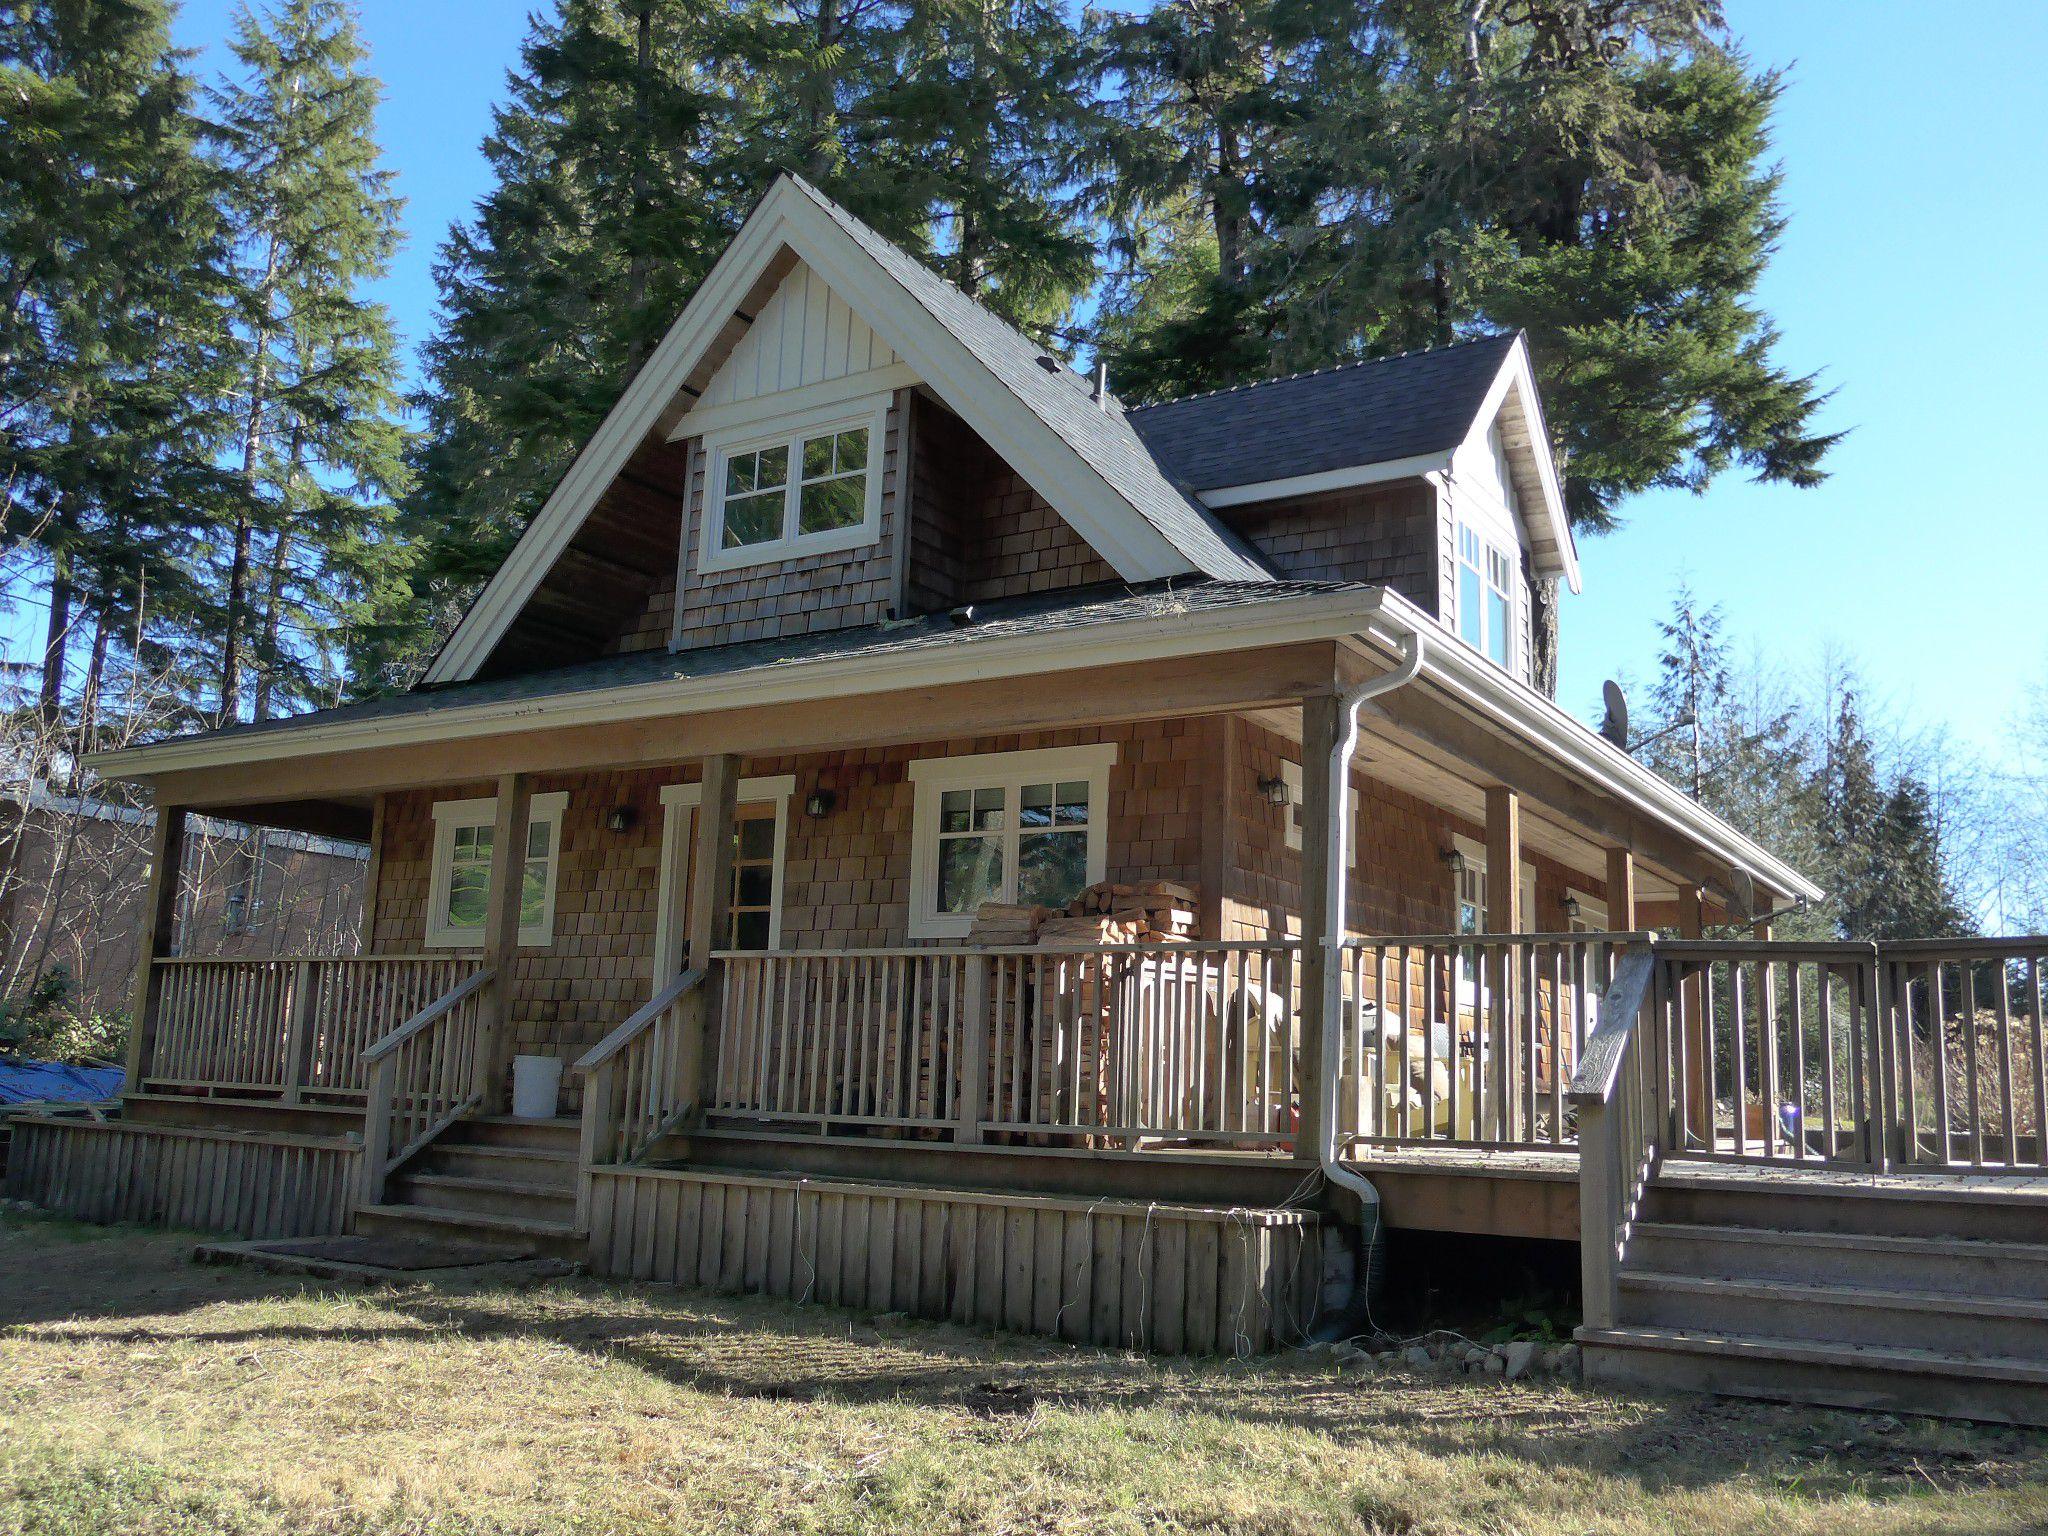 Main Photo: 194 Cape Beale Trail: Bamfield House for sale (Port Alberni)  : MLS®# 451551